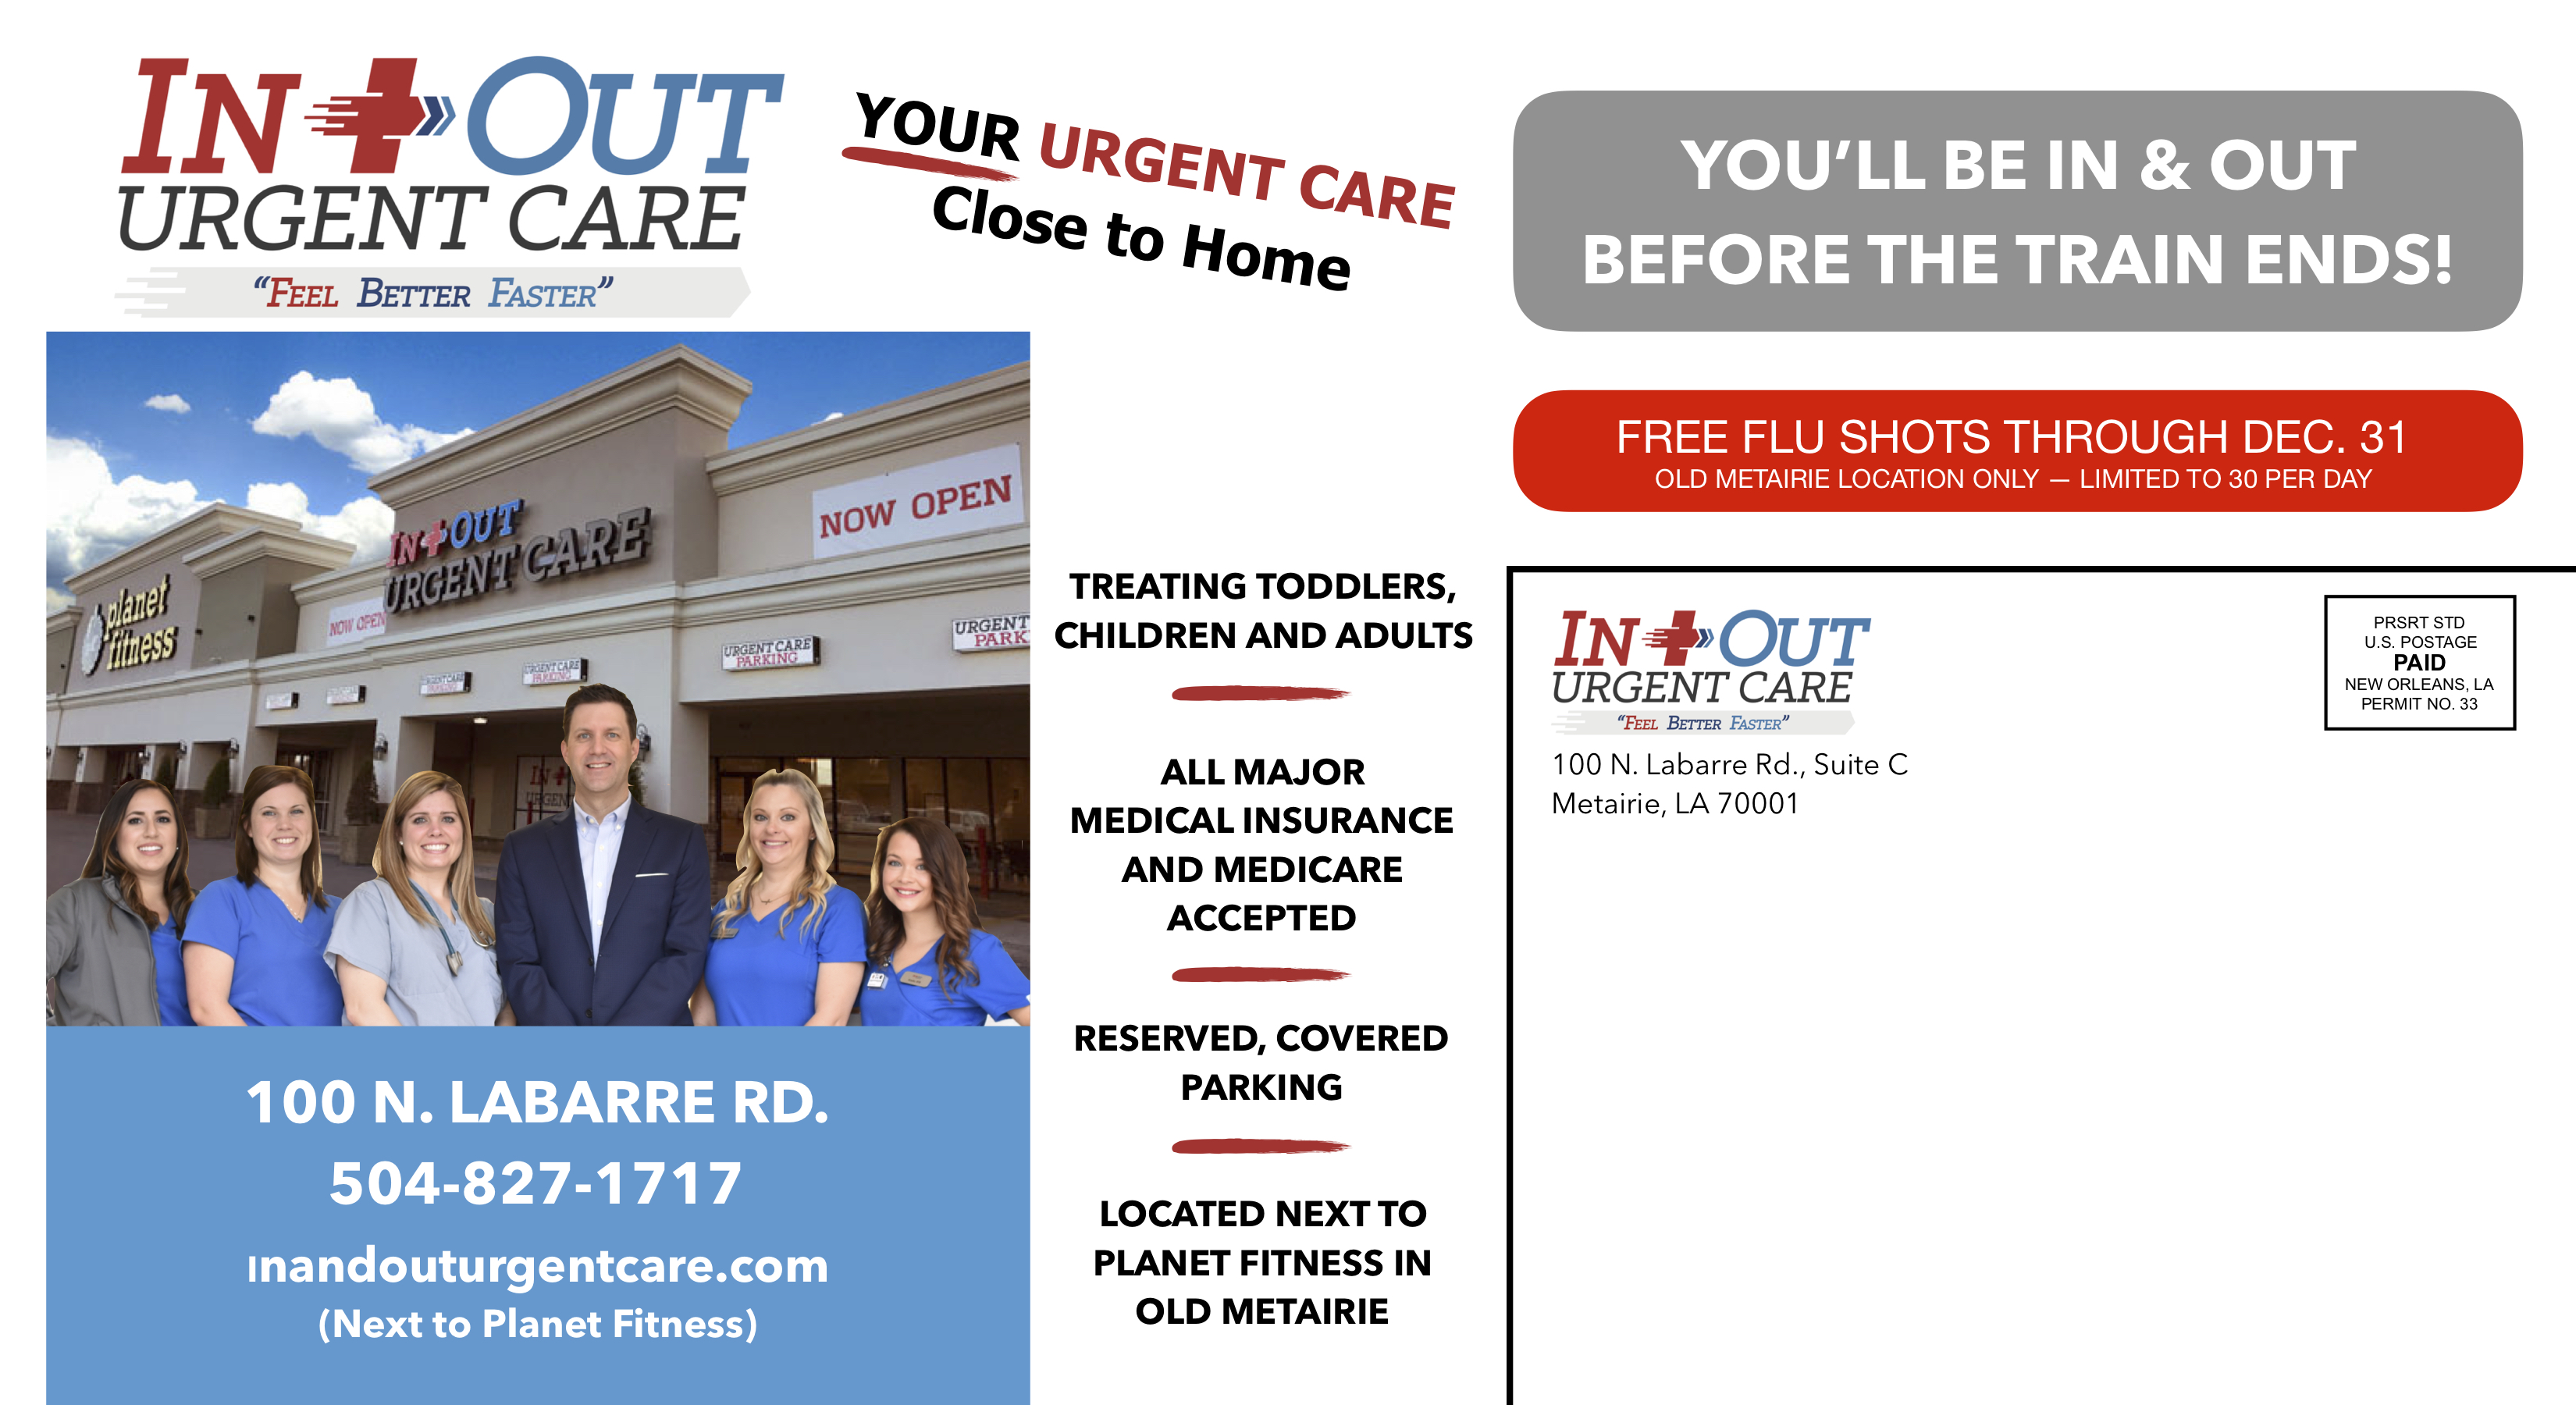 Urgent Care postcard back (11x6)